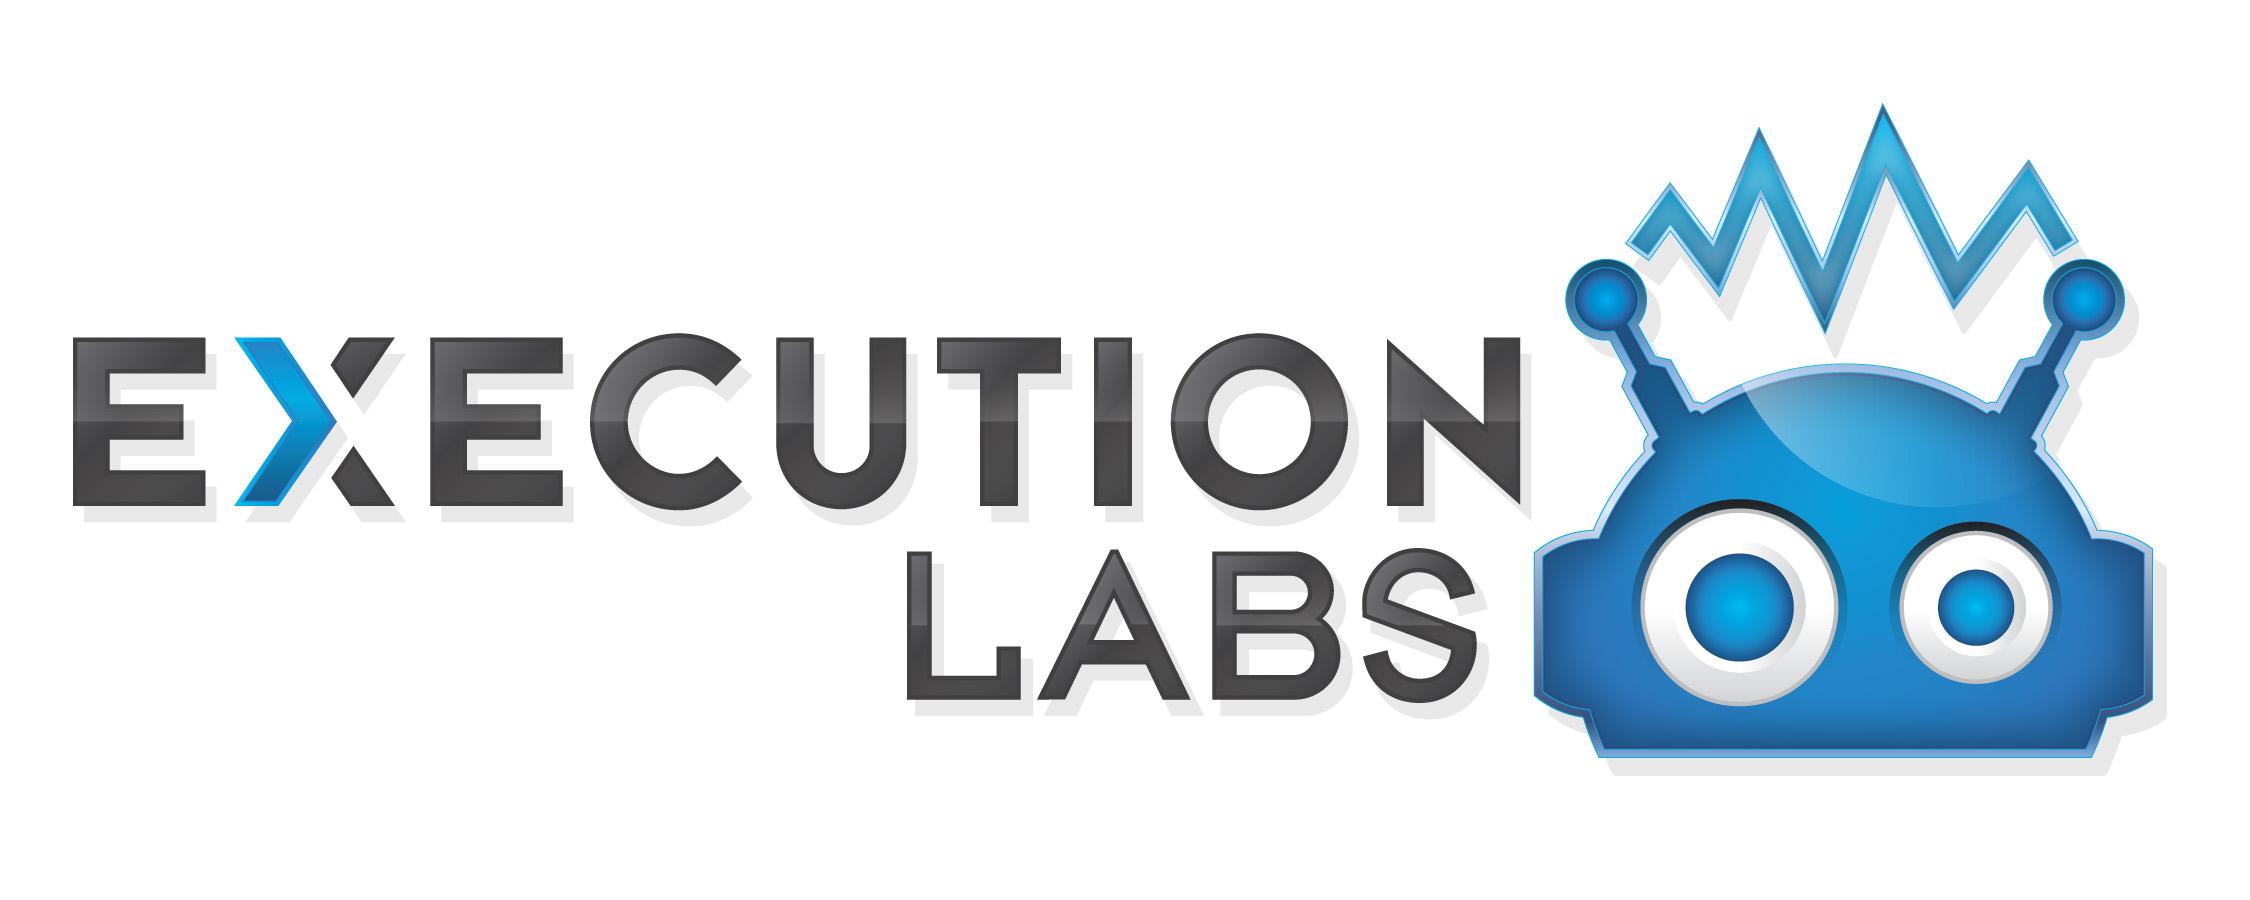 Execution Labs Logo